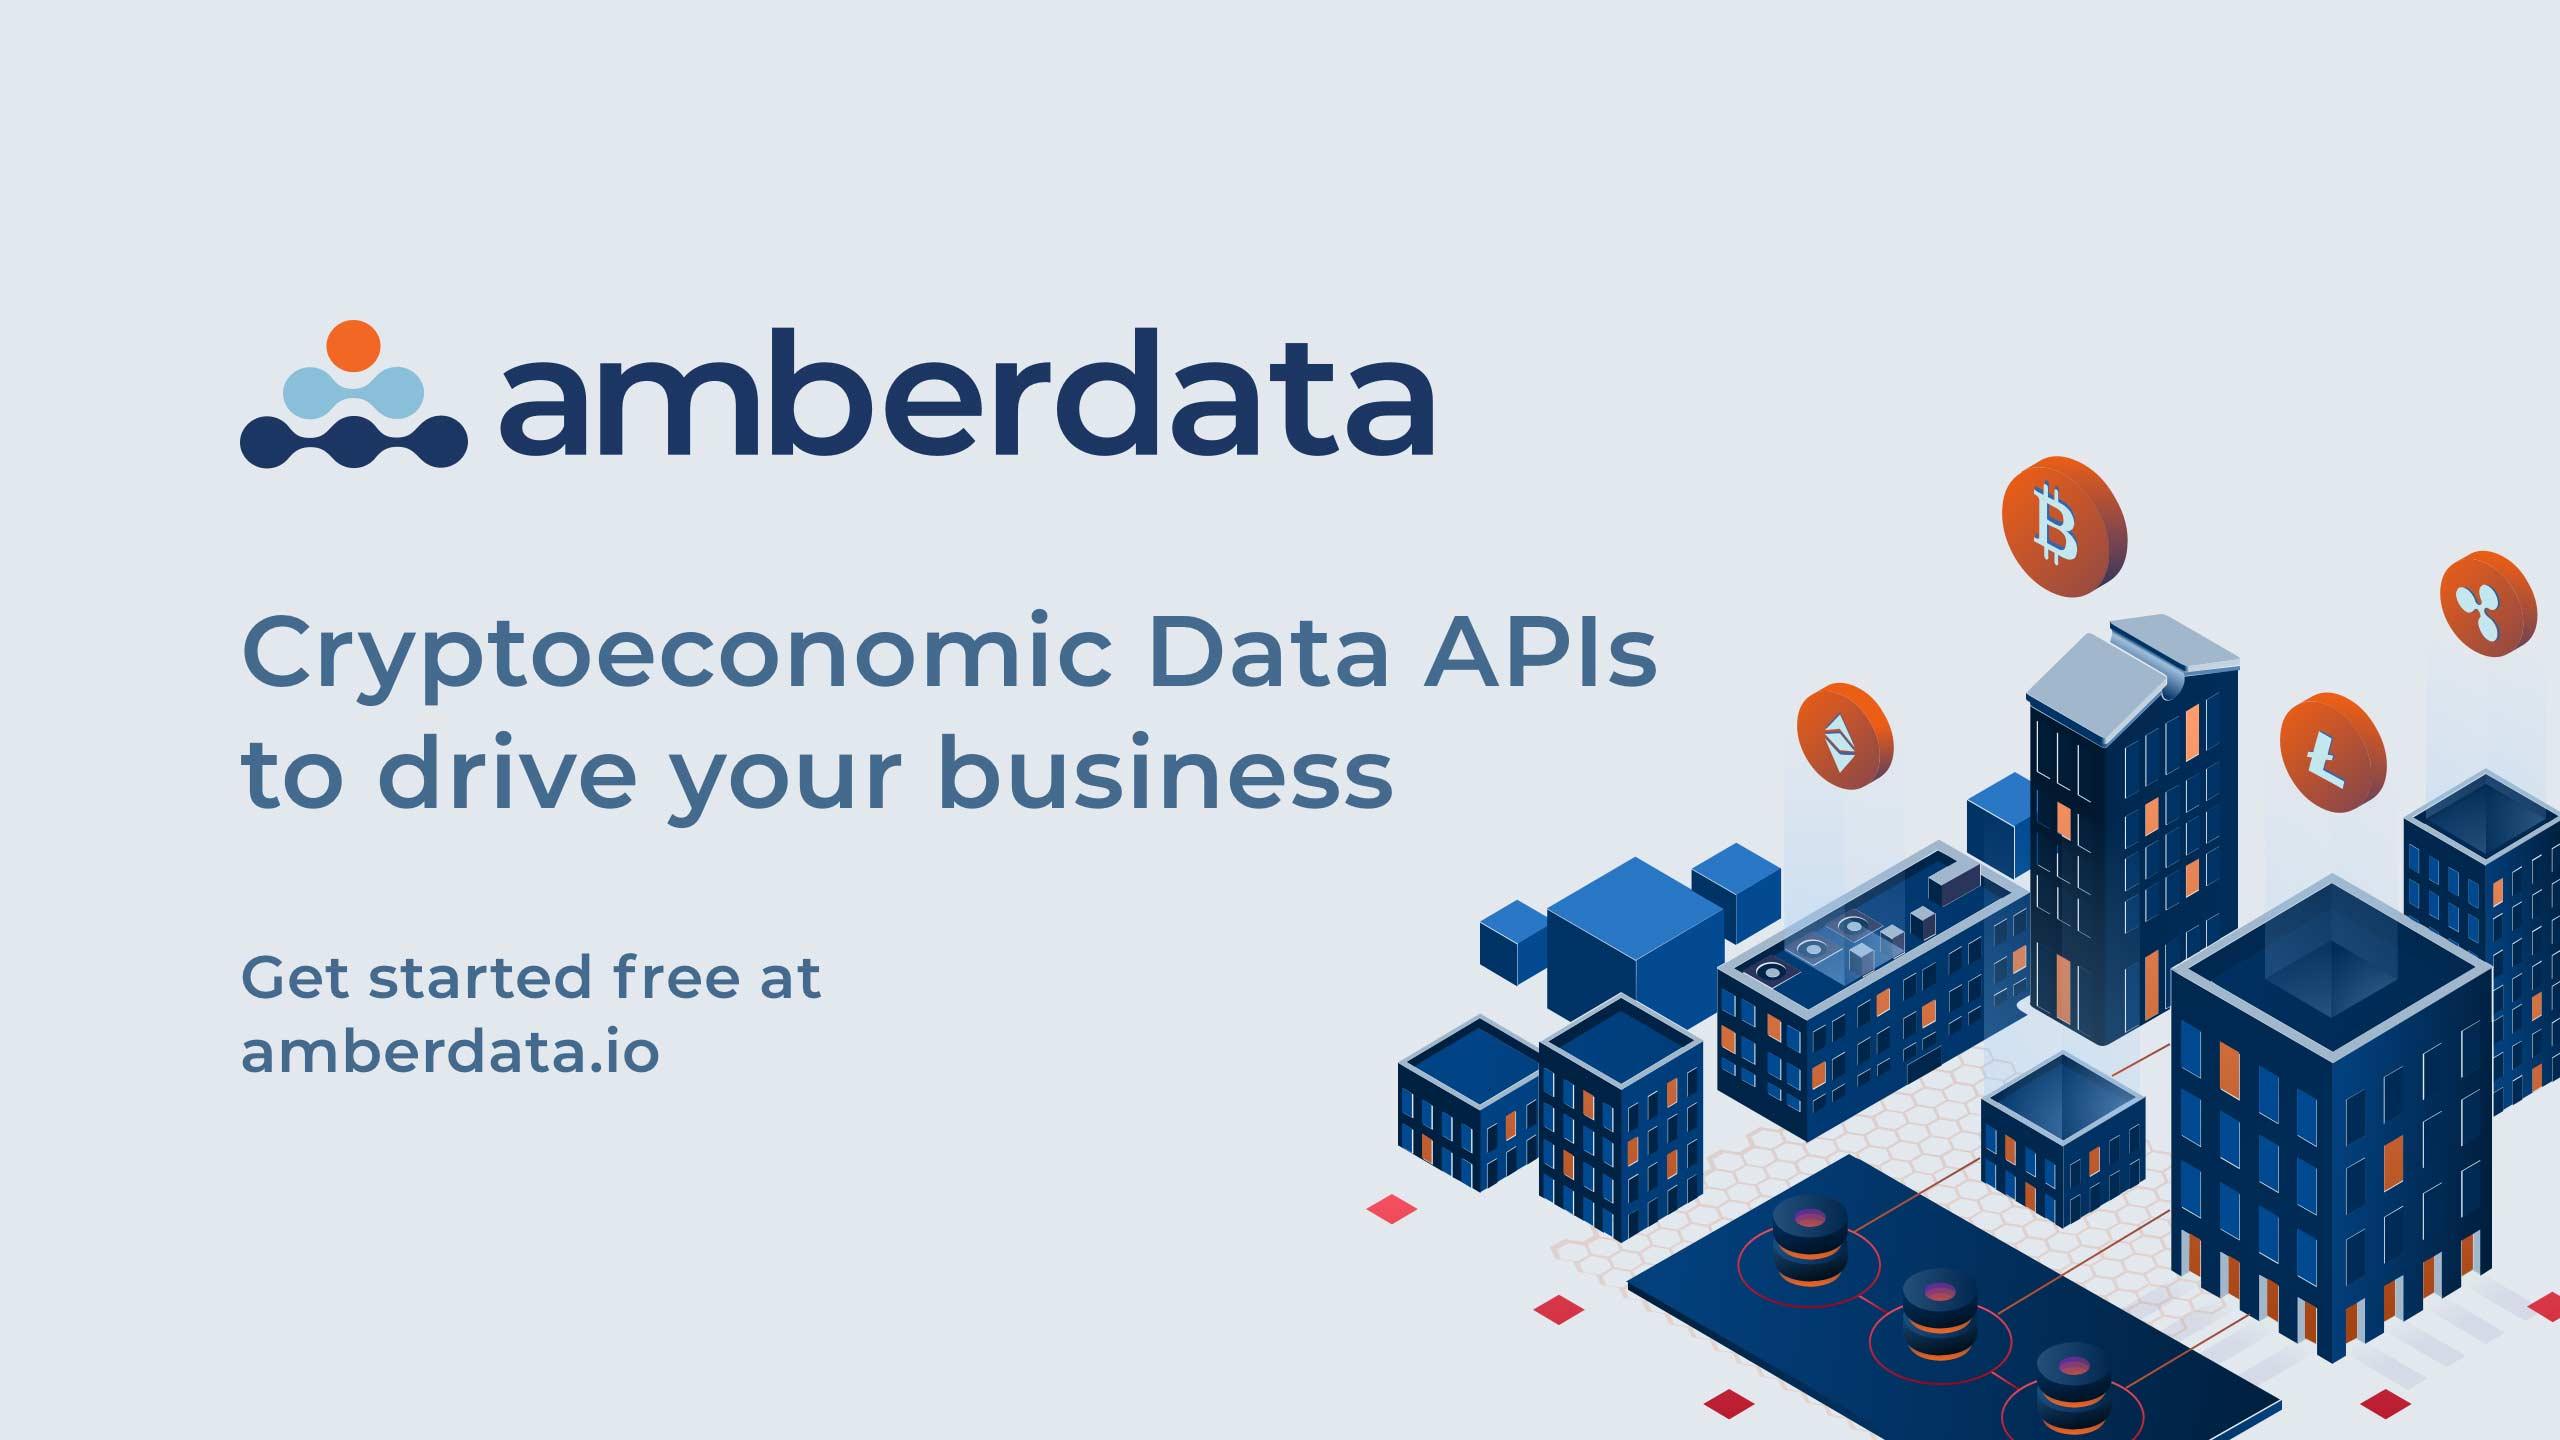 Amberdata - Cryptoeconomic Data to drive your business